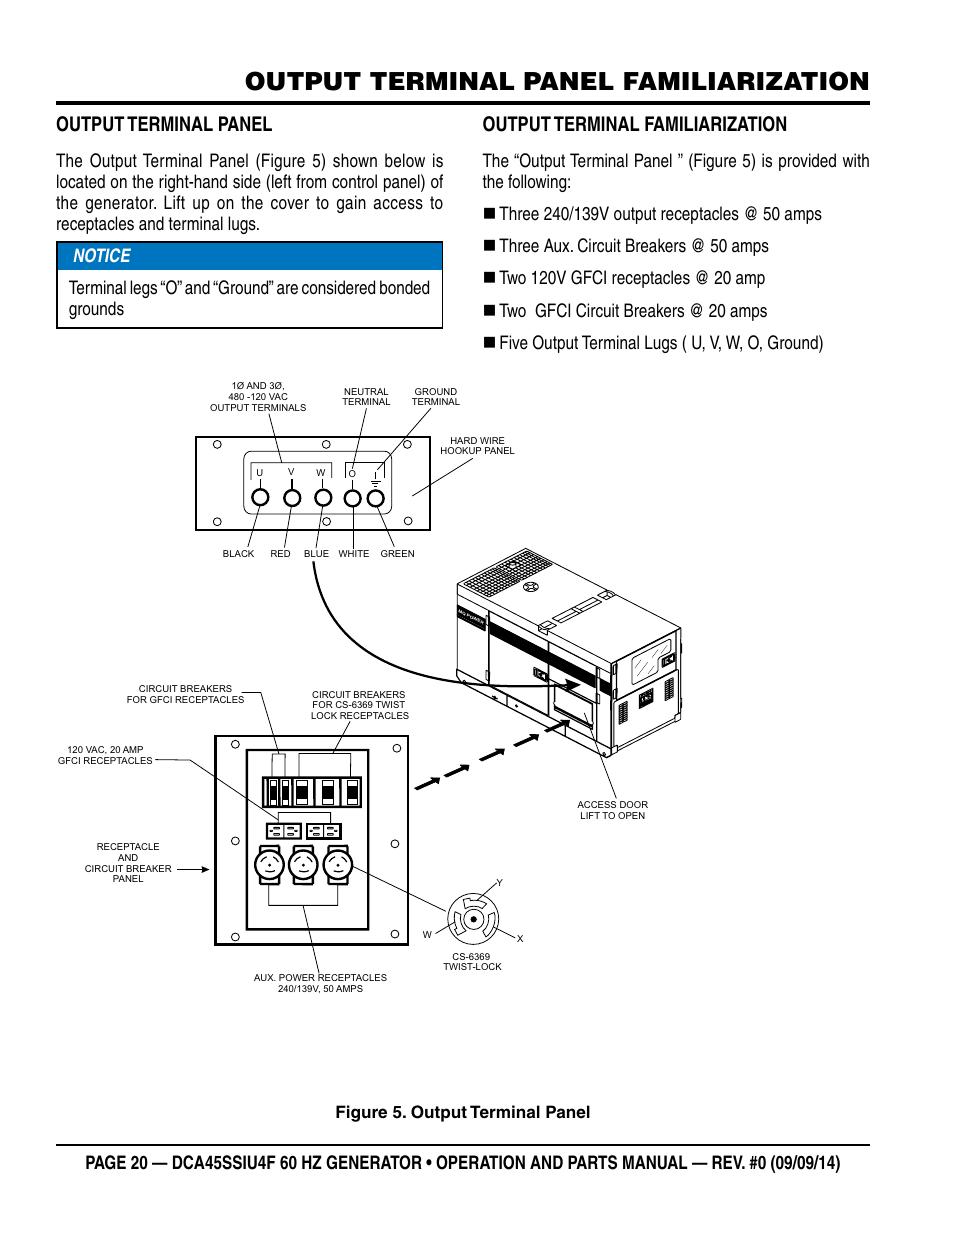 Output Terminal Panel Familiarization Wiring Diagram 50 Amp Gfci Breaker Multiquip Dca45ssiu4f User Manual Page 20 98